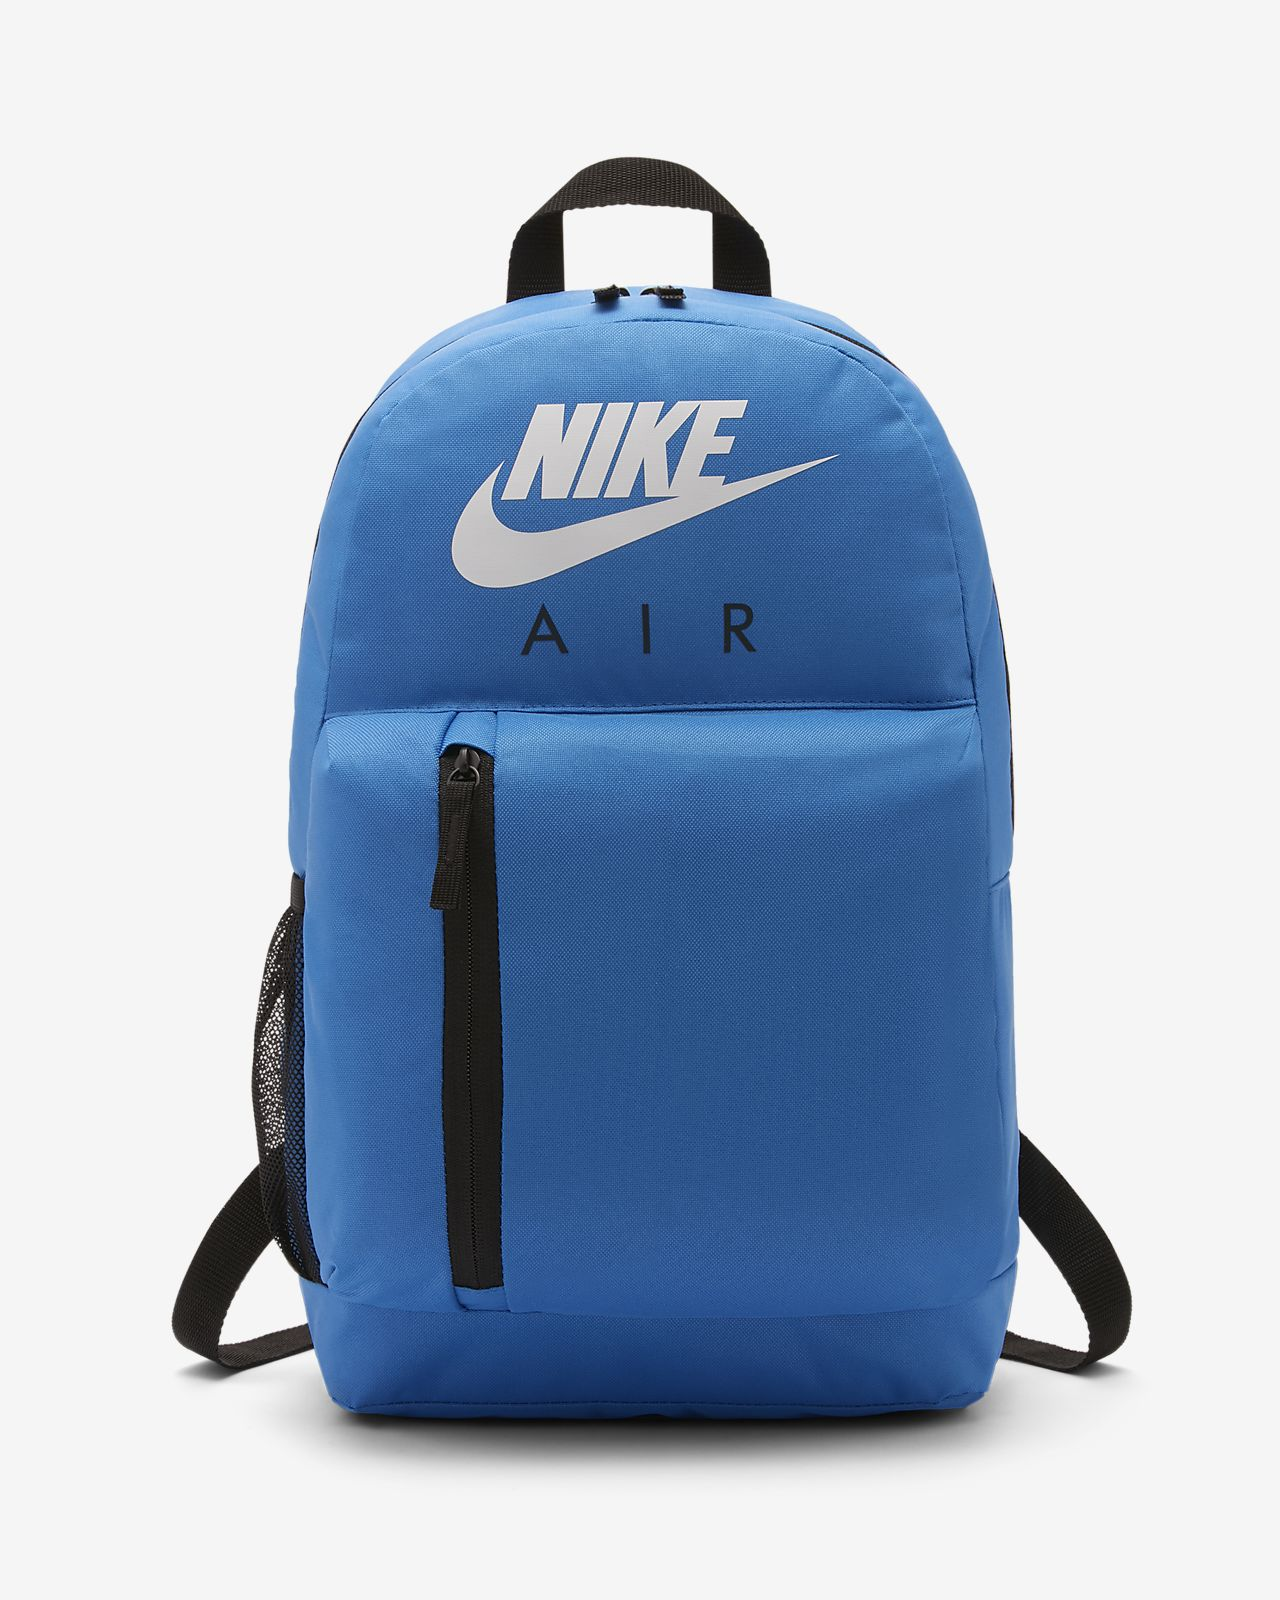 Mochila Es Niñoa Nike Elemental Elemental Nike xCwU8wt0q